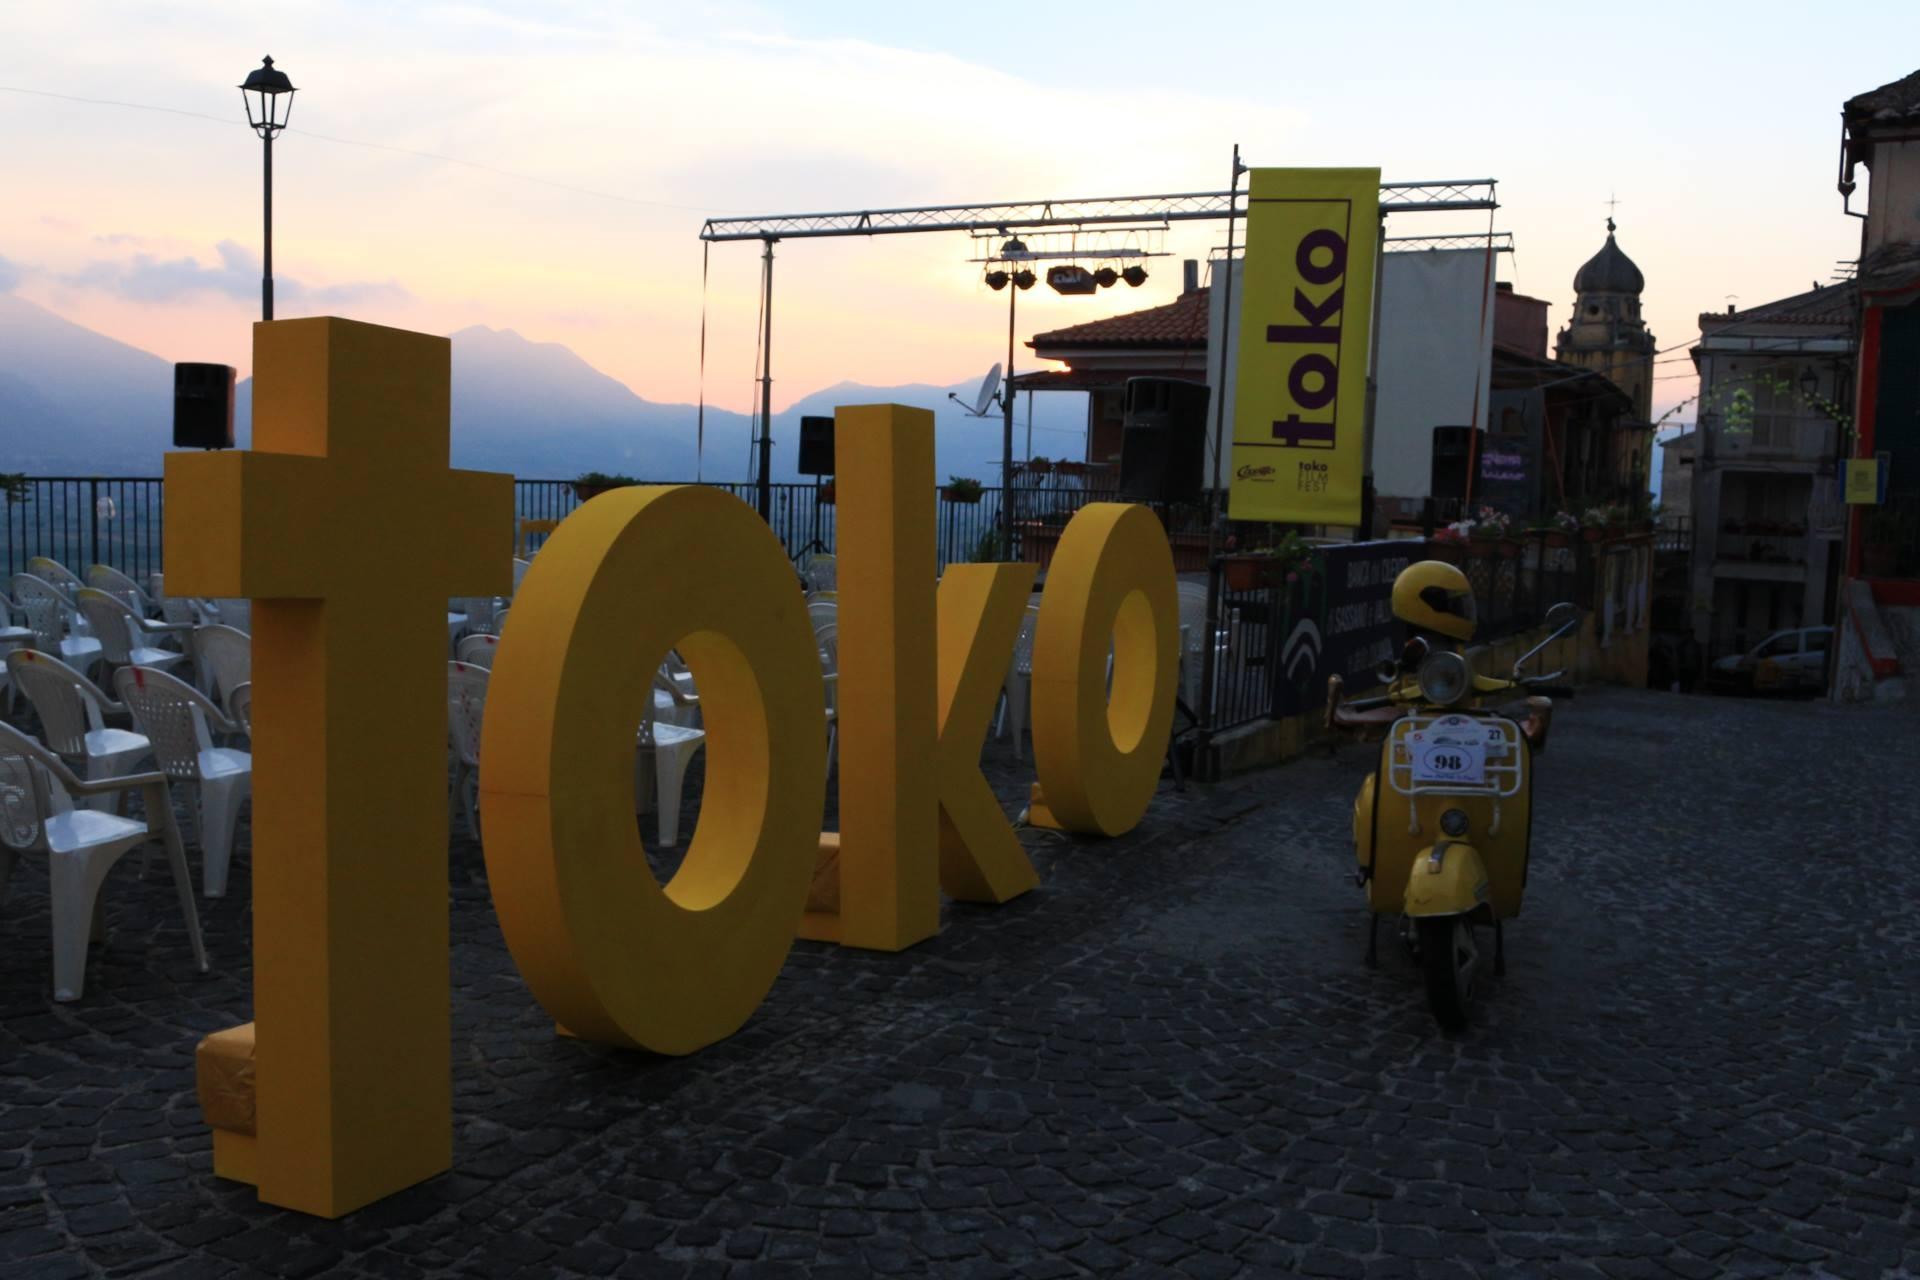 toko film festival (2)